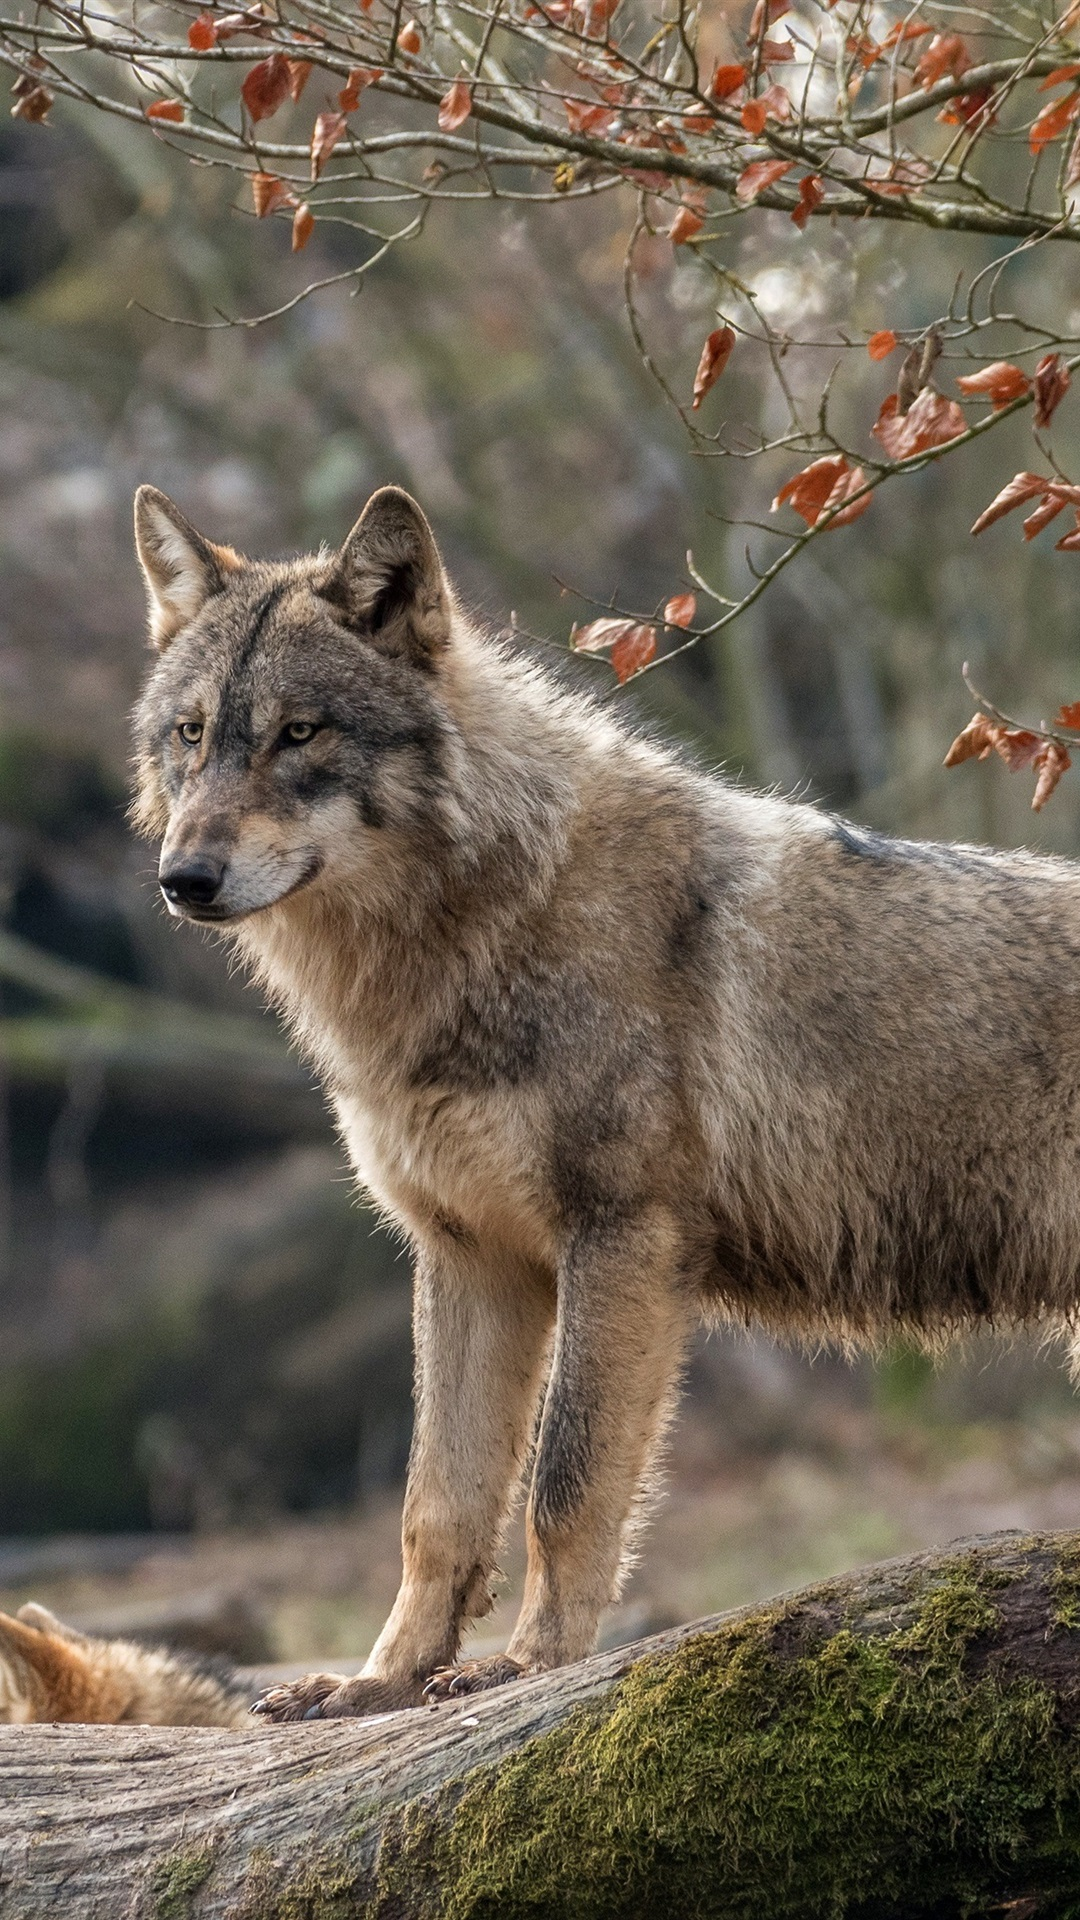 狼の表情 森 1080x1920 Iphone 8 7 6 6s Plus 壁紙 背景 画像